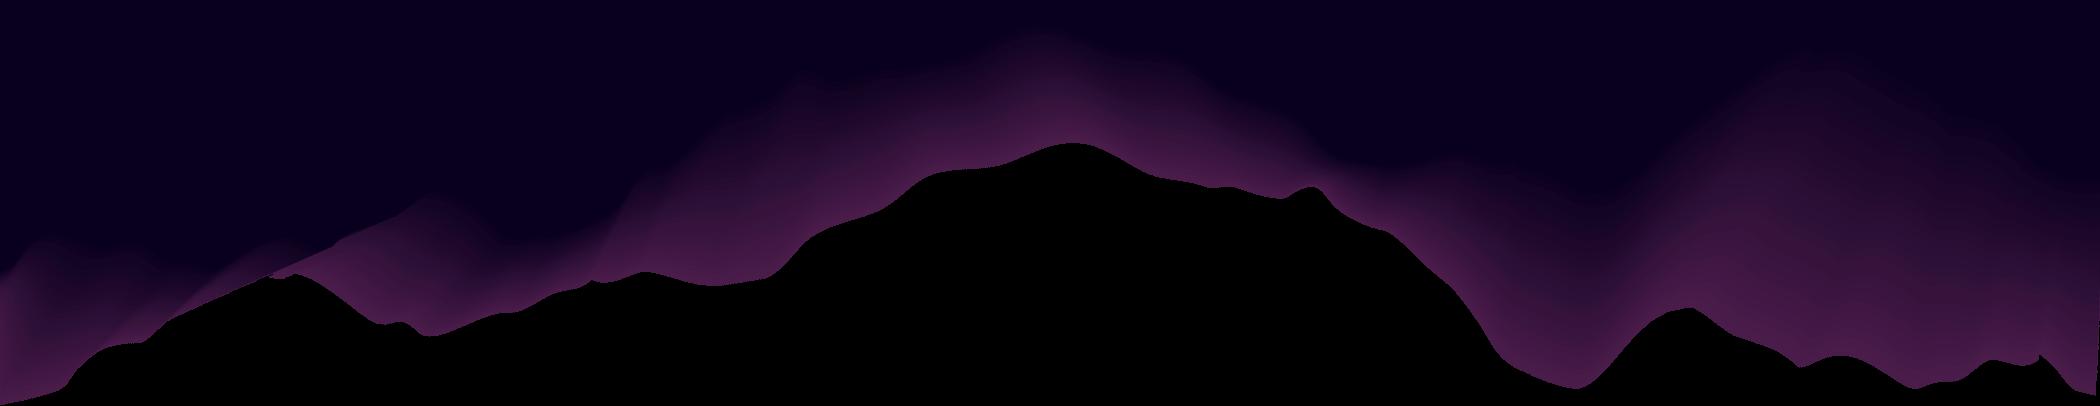 http://www.marabout-diawara.com/wp-content/uploads/2018/05/dark_purple_bottom_divider.png